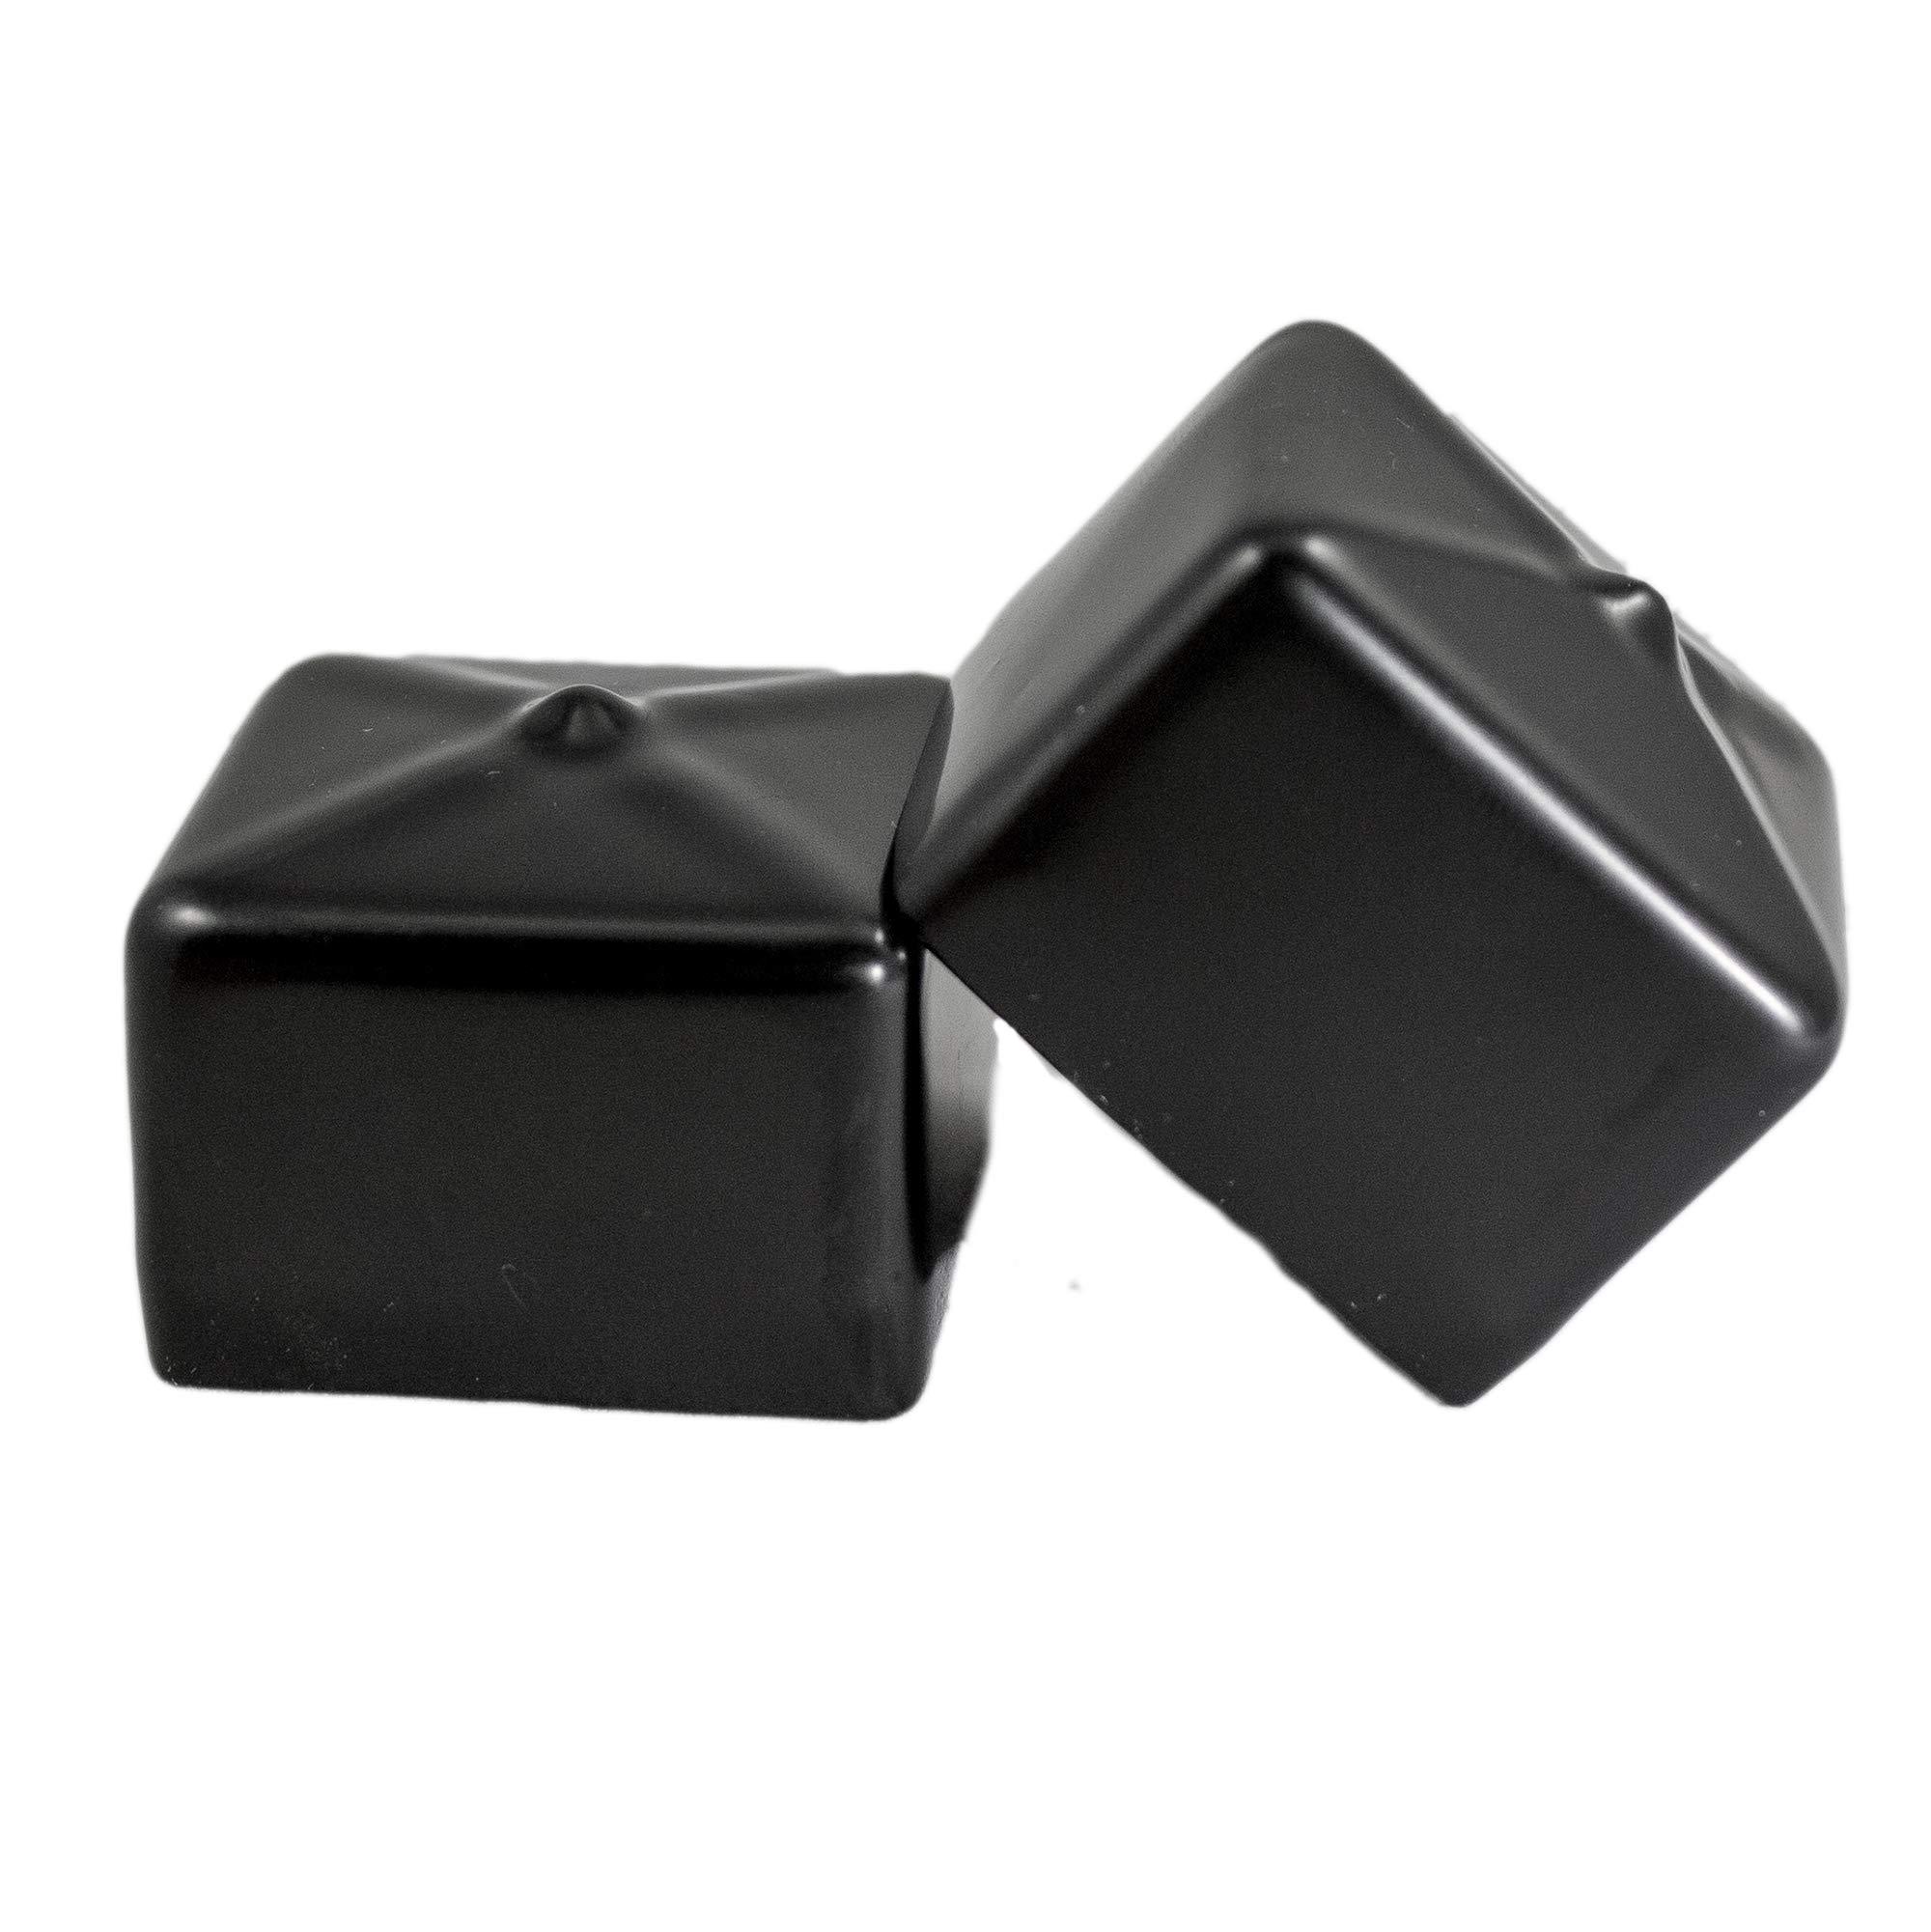 Prescott Plastics 1 1/2 Inch Square Black Vinyl End Cap, Flexible Pipe Post Rubber Cover ((C) Pack of 20 Caps) by Prescott Plastics